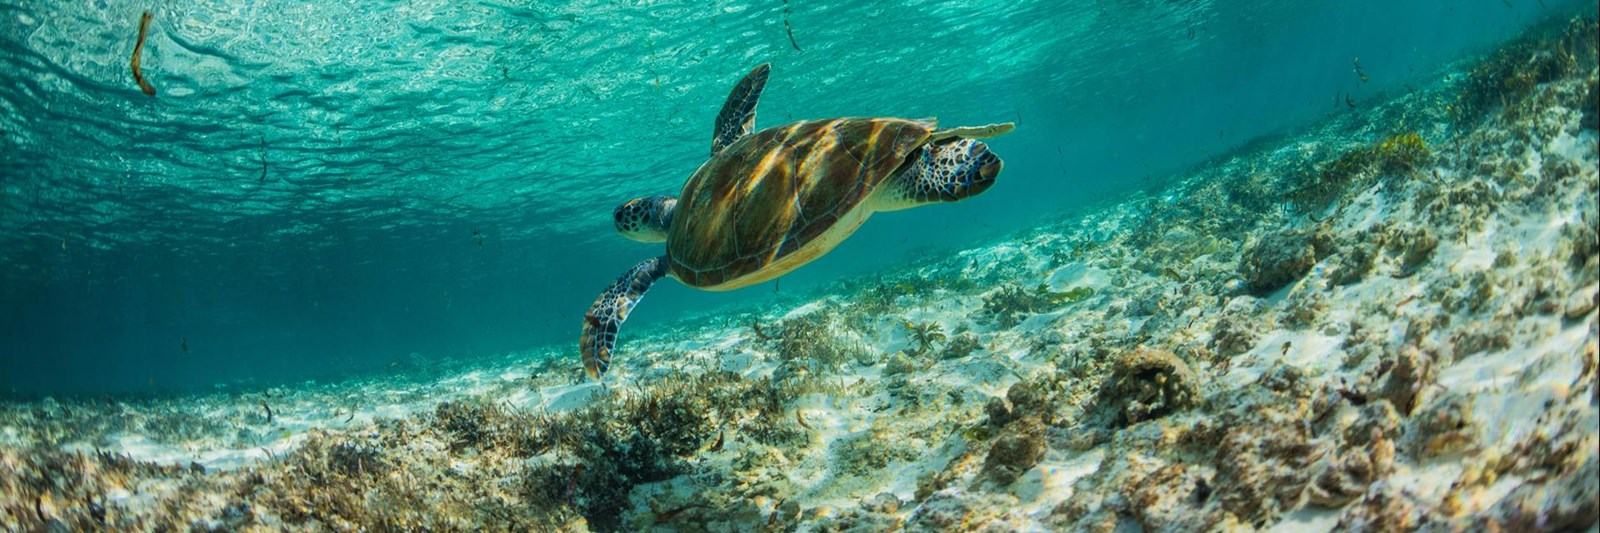 Marine Life Conservation. Sea Turtle at Bird Island Seychelles